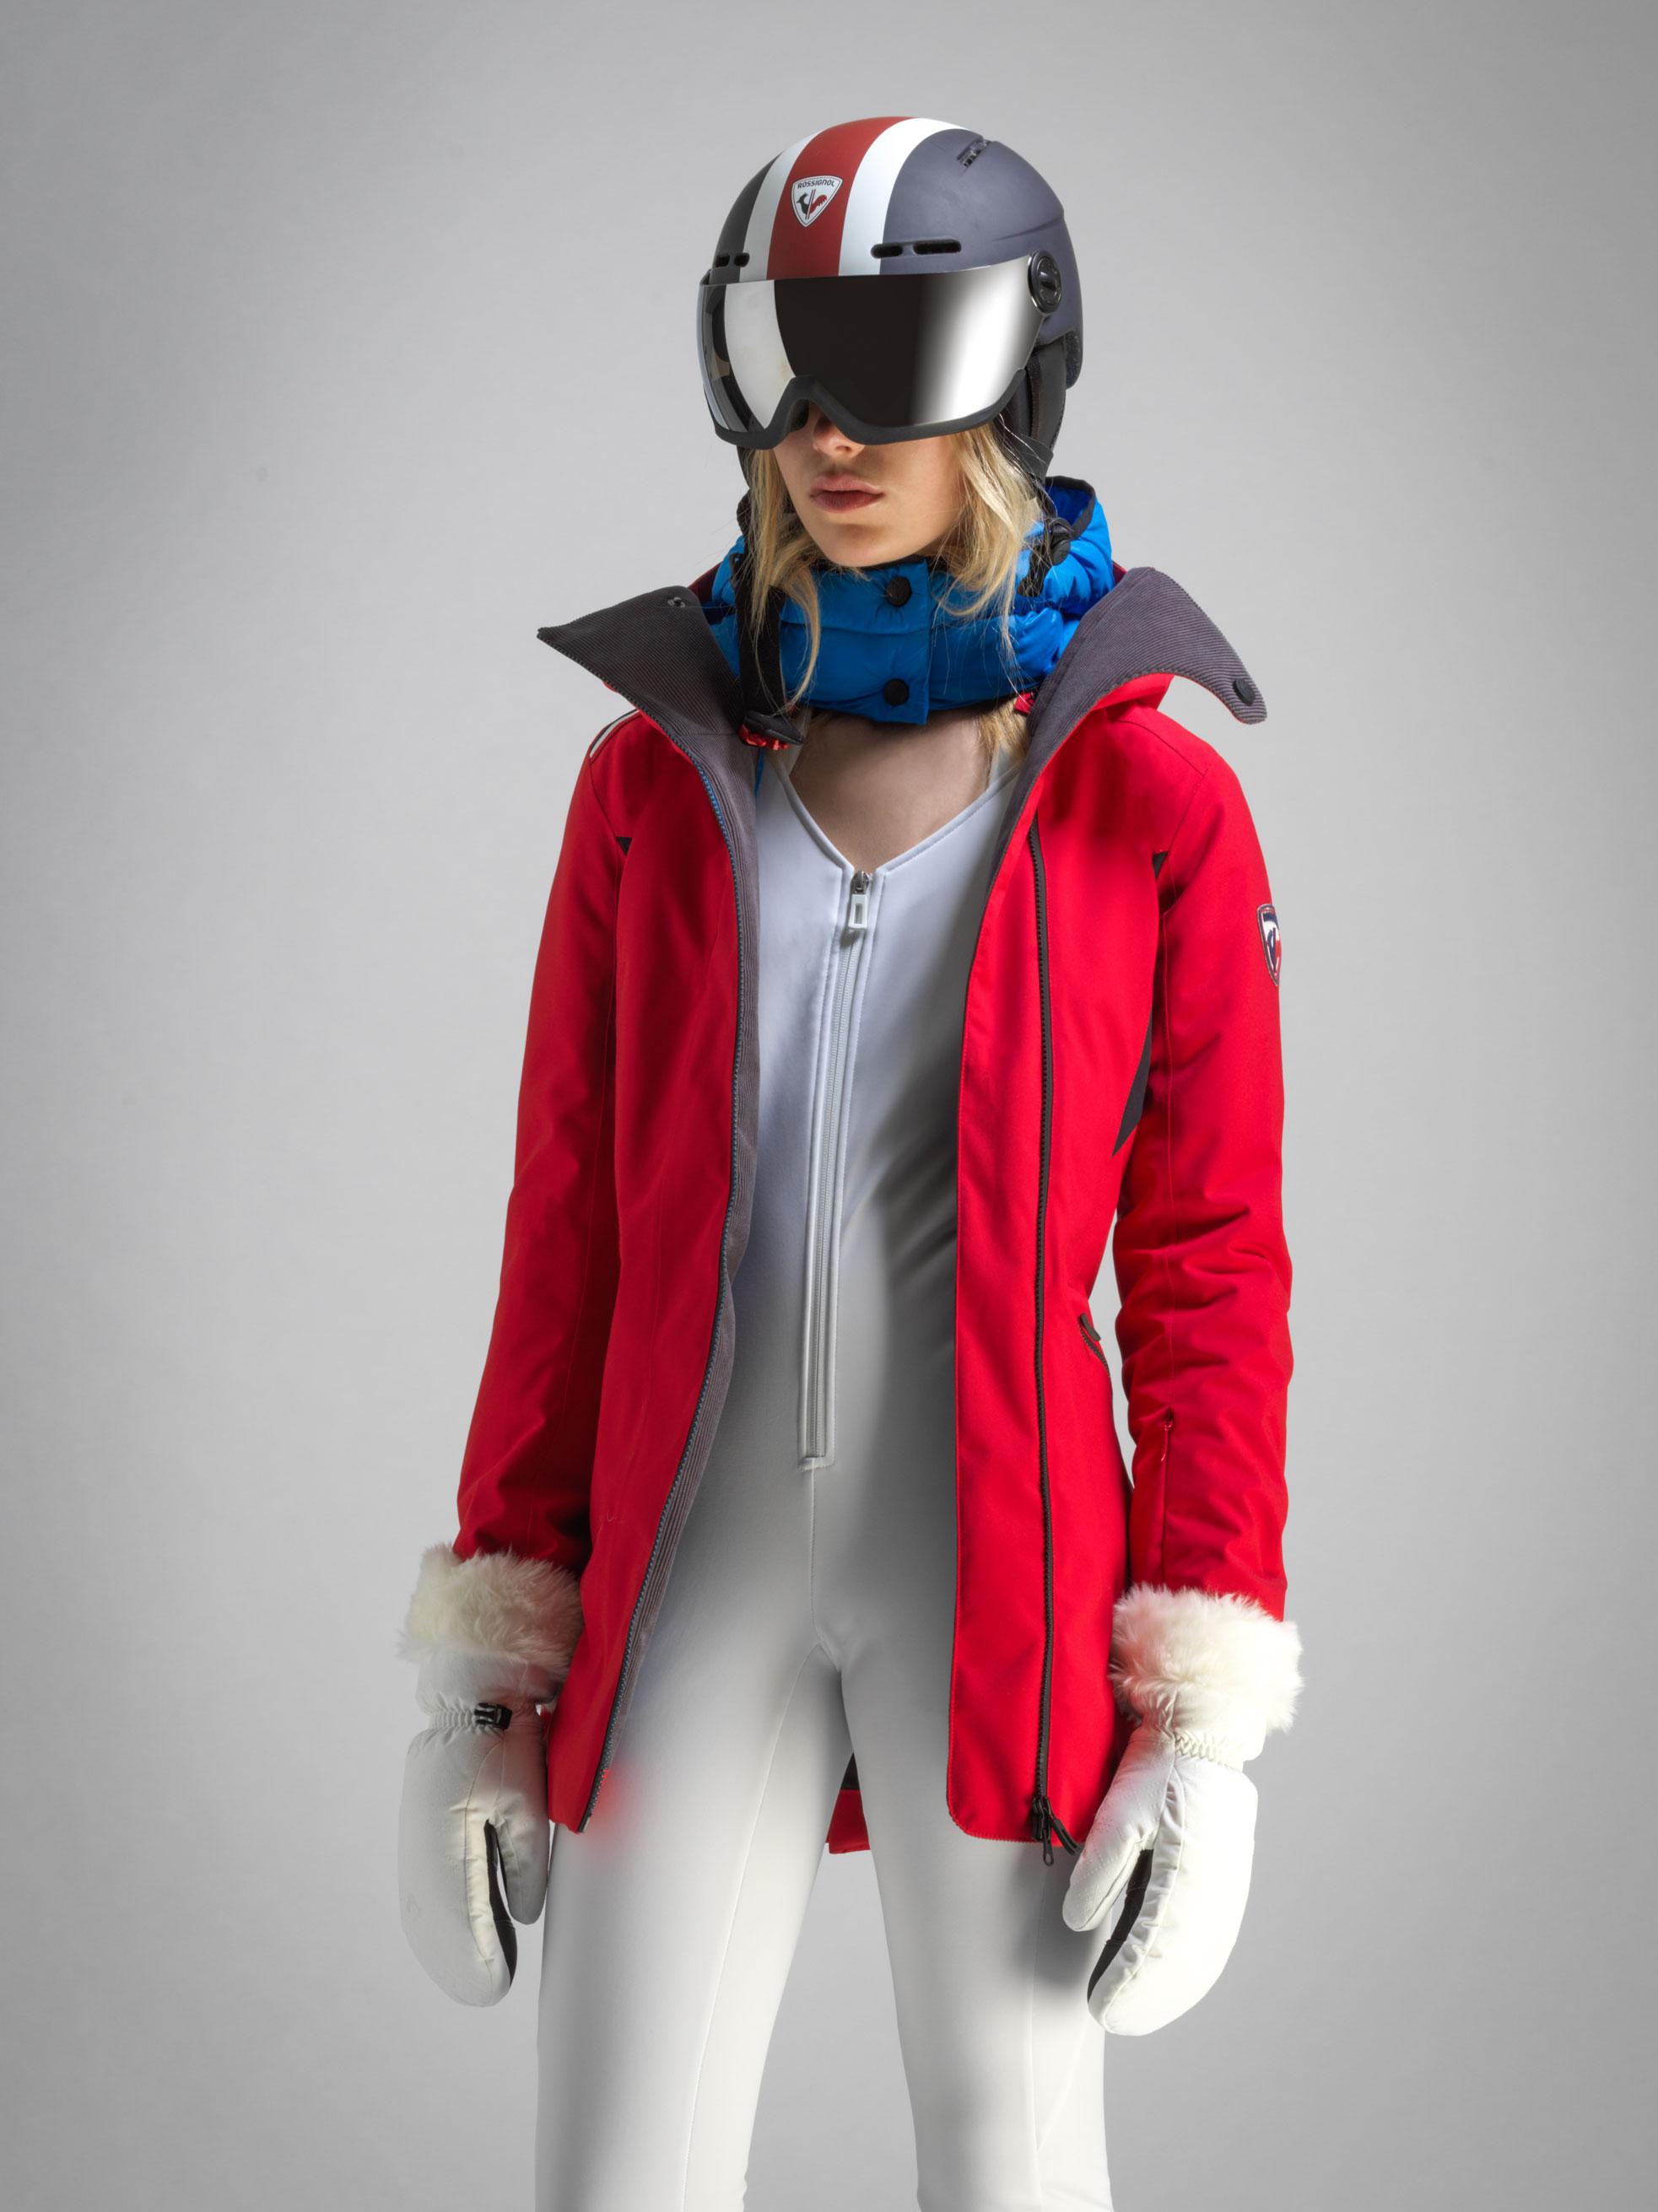 rossignol-apparel-mode-vetement-ski